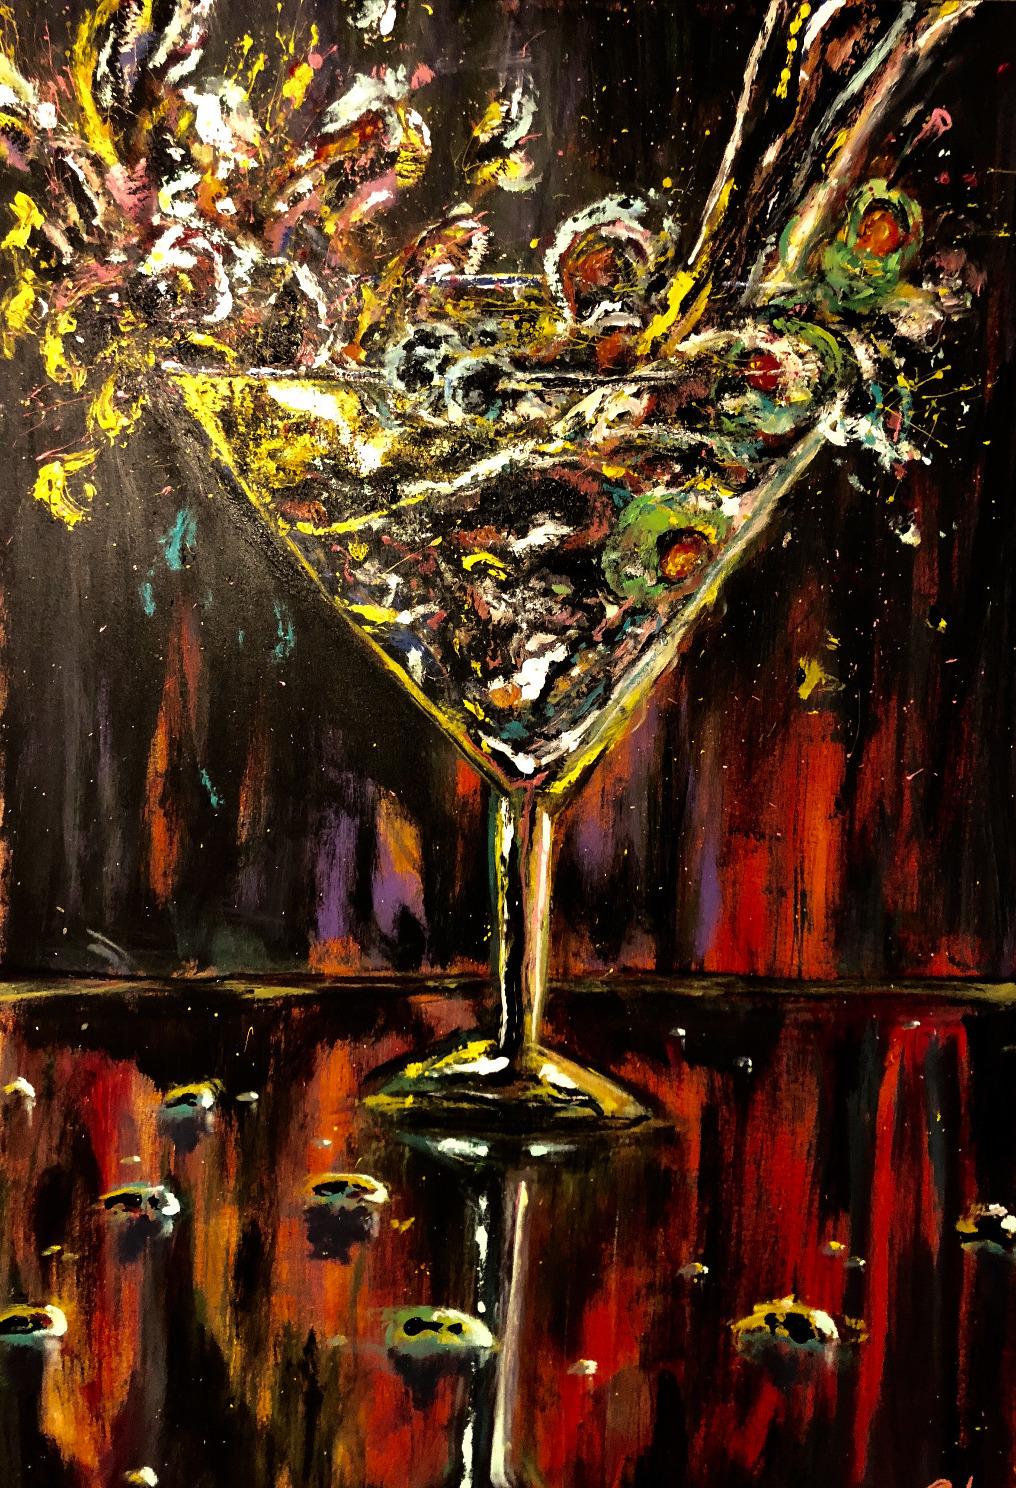 Splash Martini: SOLD